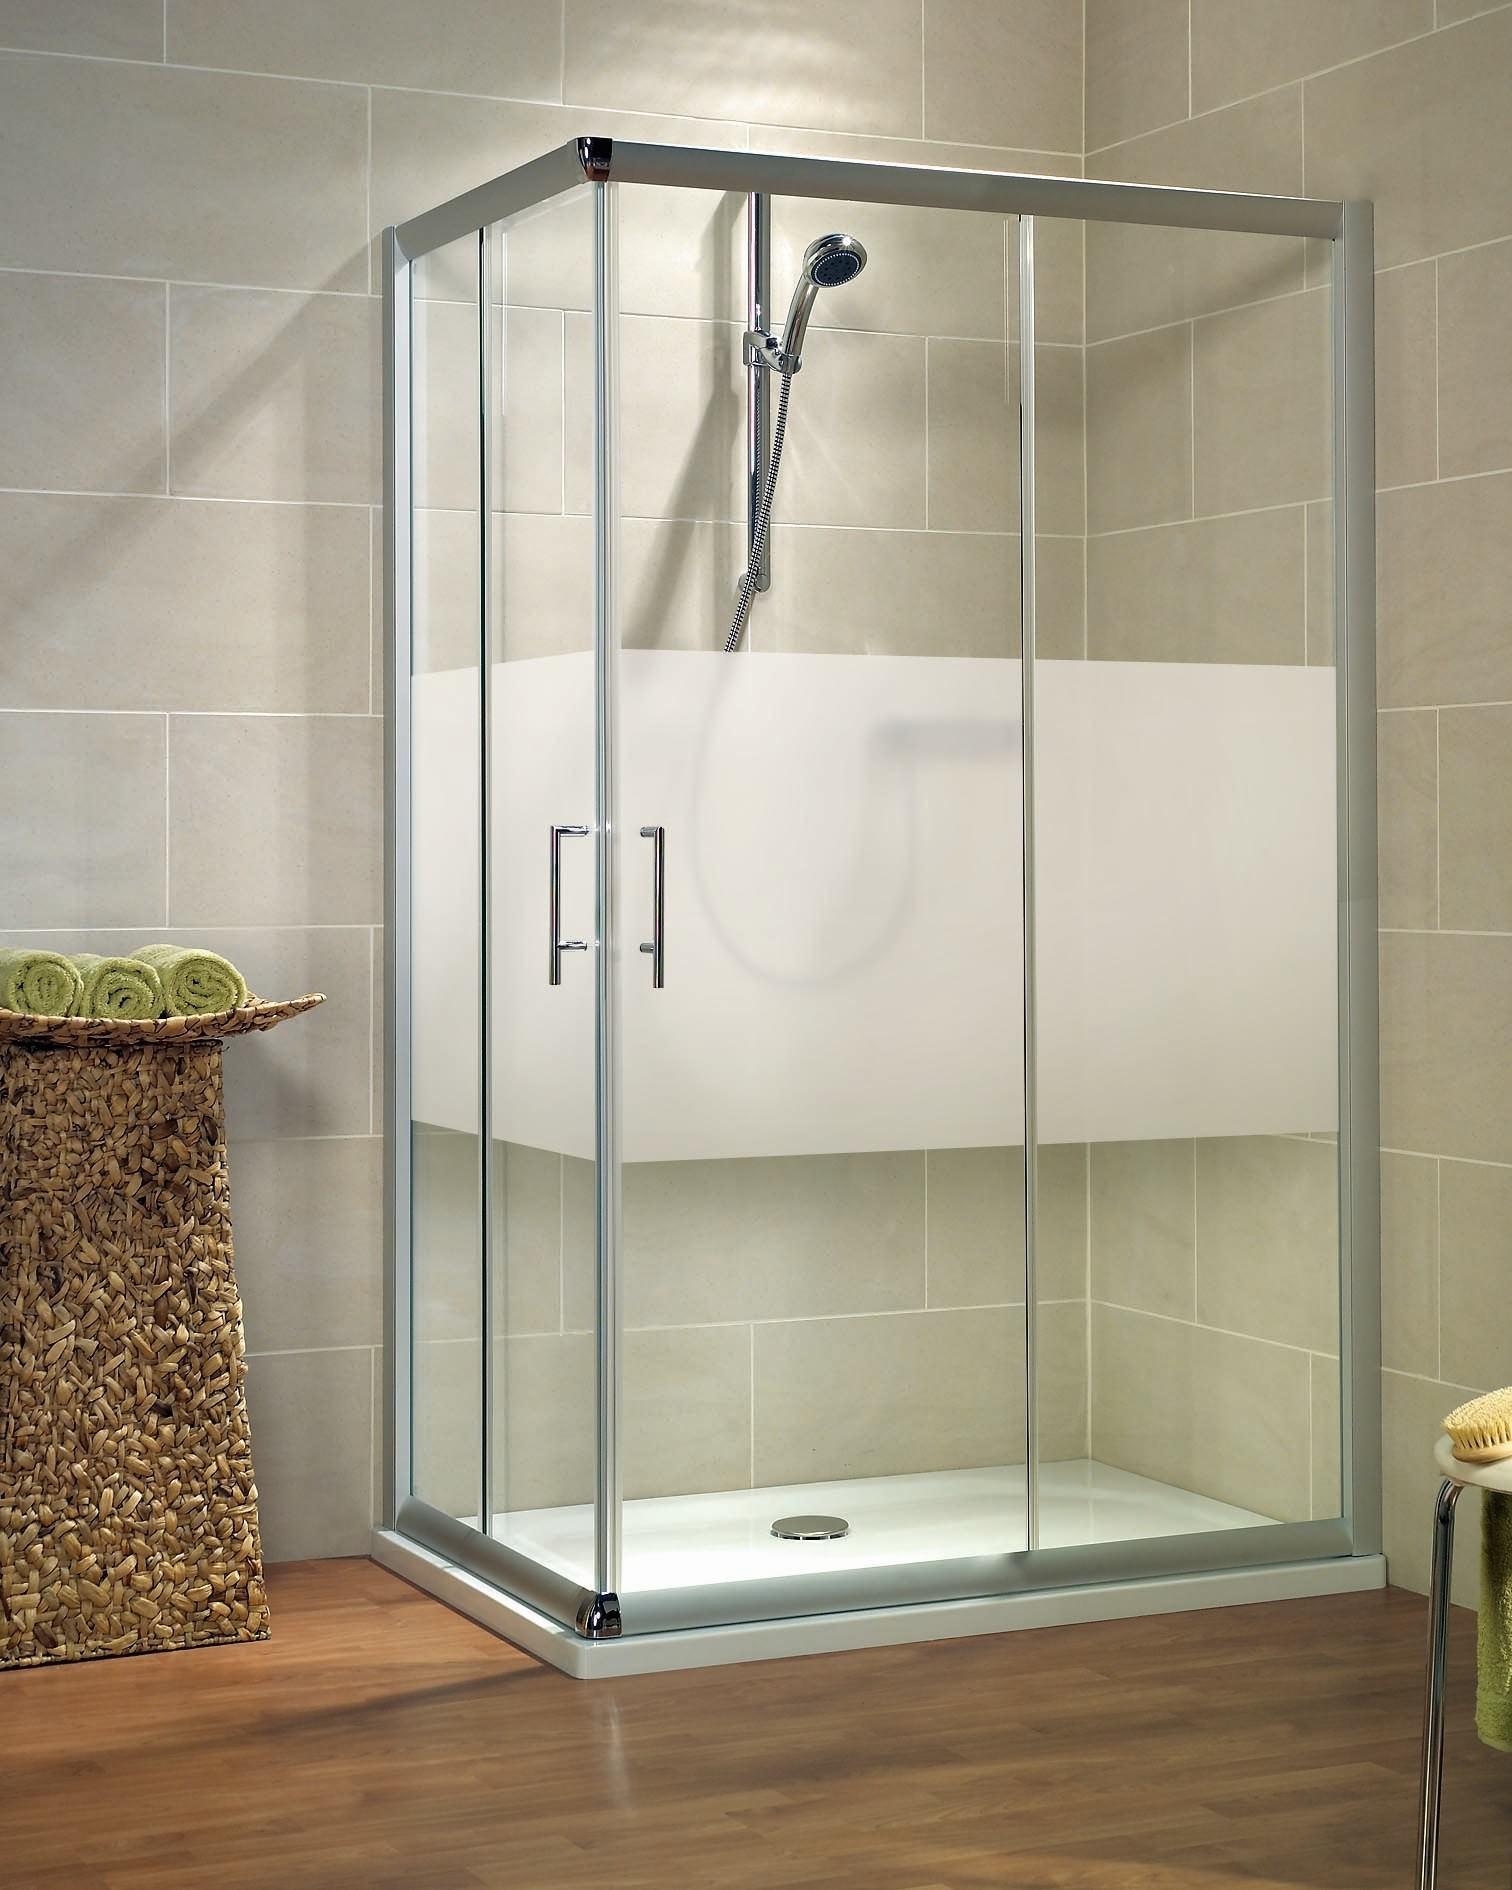 Schulte duschen erfahrungen - Duschruckwand ohne fliesen ...